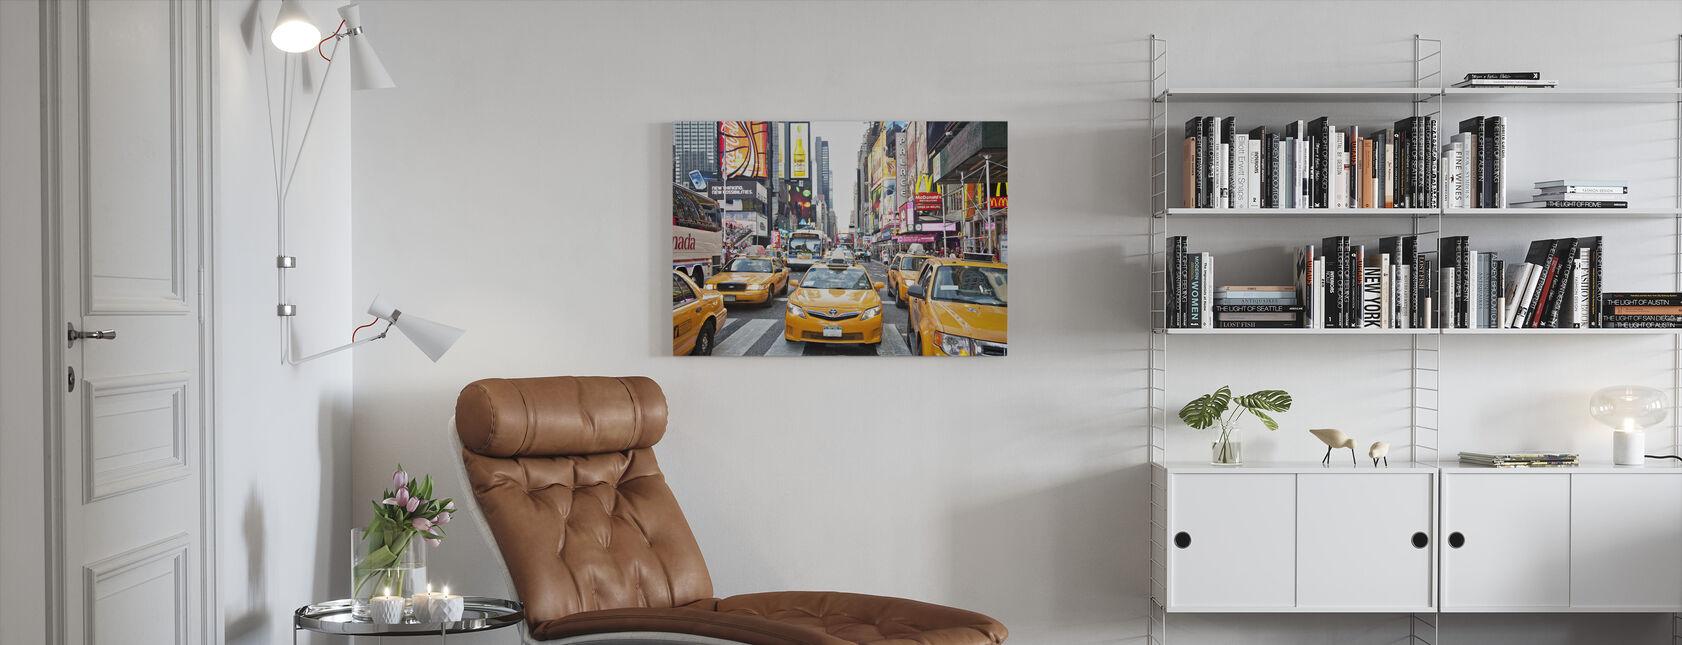 Taksit ja kapitalismi, New York - Canvastaulu - Olohuone